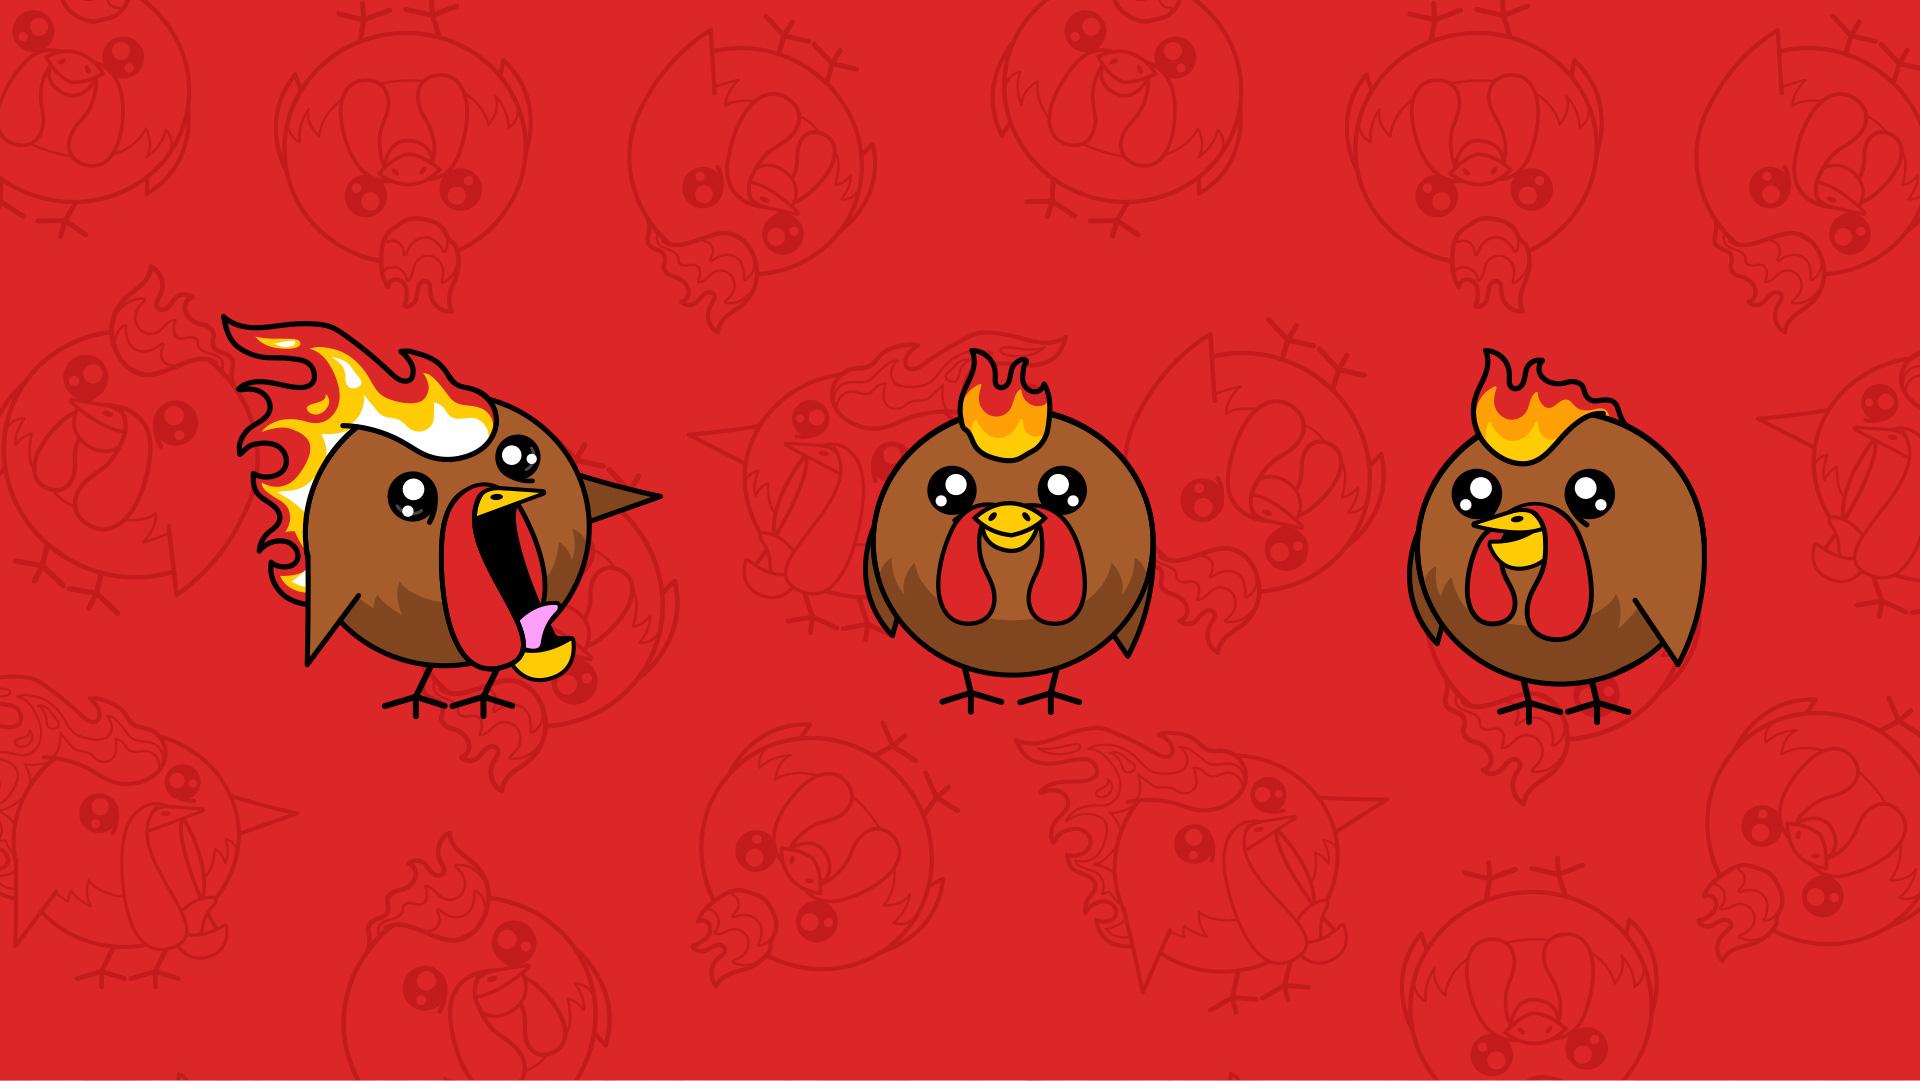 5.Chicken.jpg